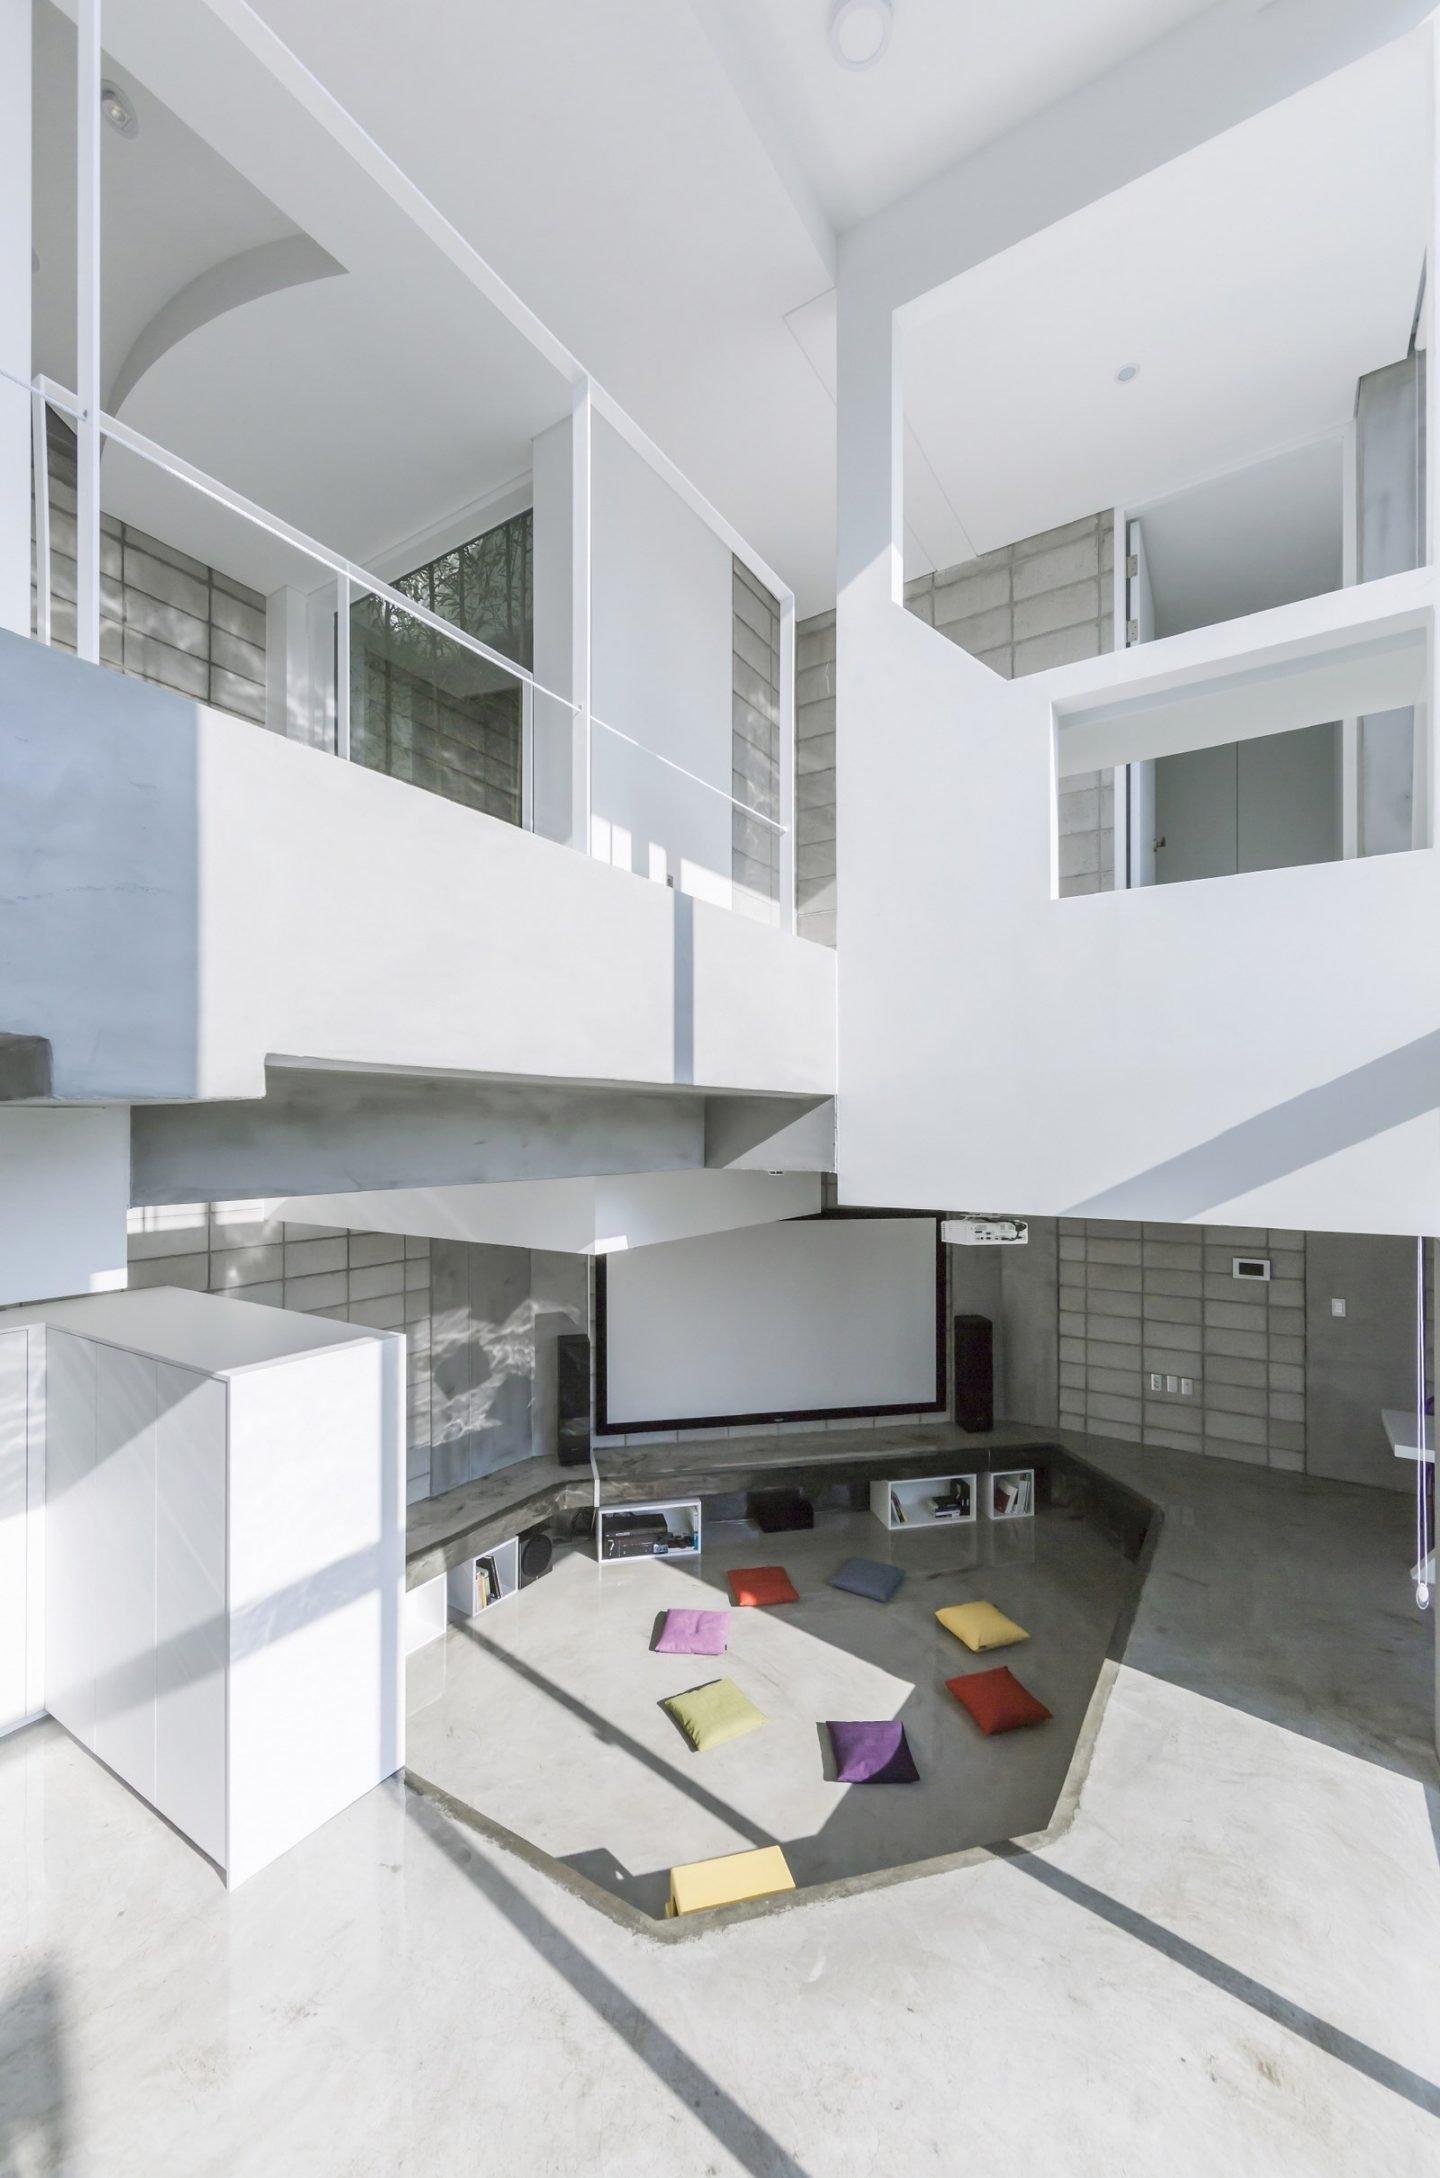 Iroje_KHM_Architecture (15)